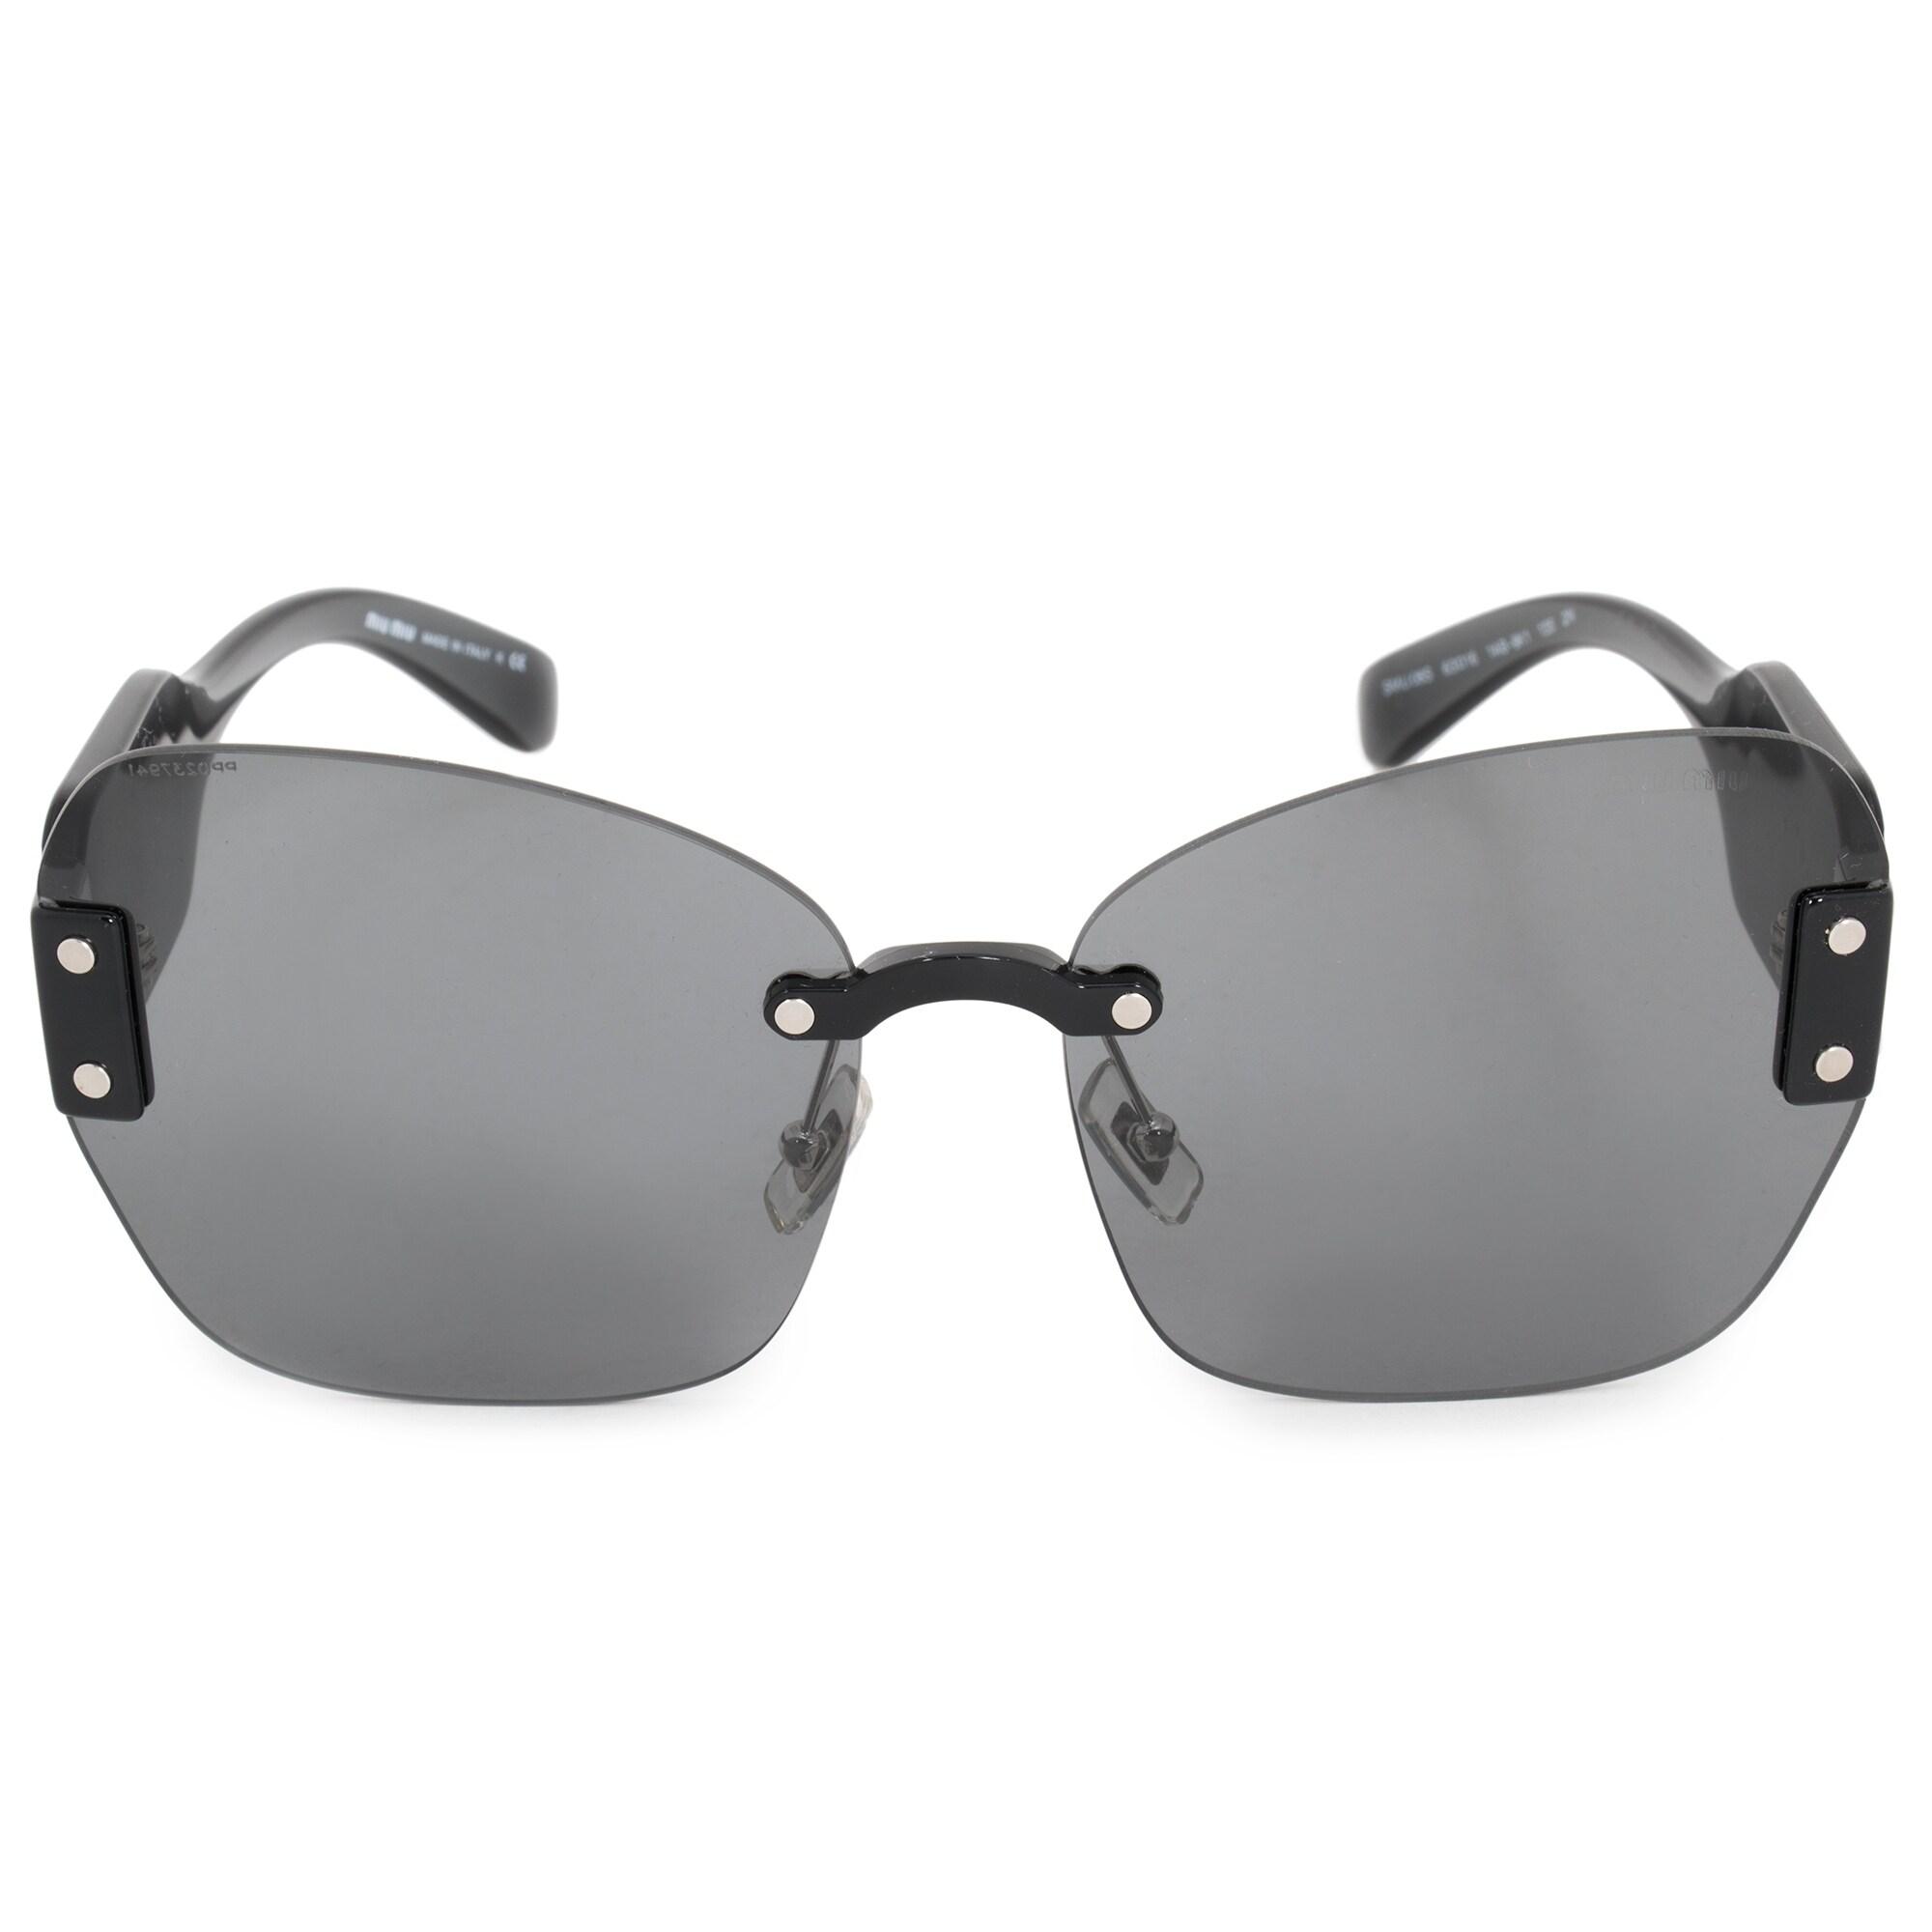 c9edc04f55c Shop Miu Miu Butterfly Sunglasses SMU08SS 1AB9K1 63 - Free Shipping ...